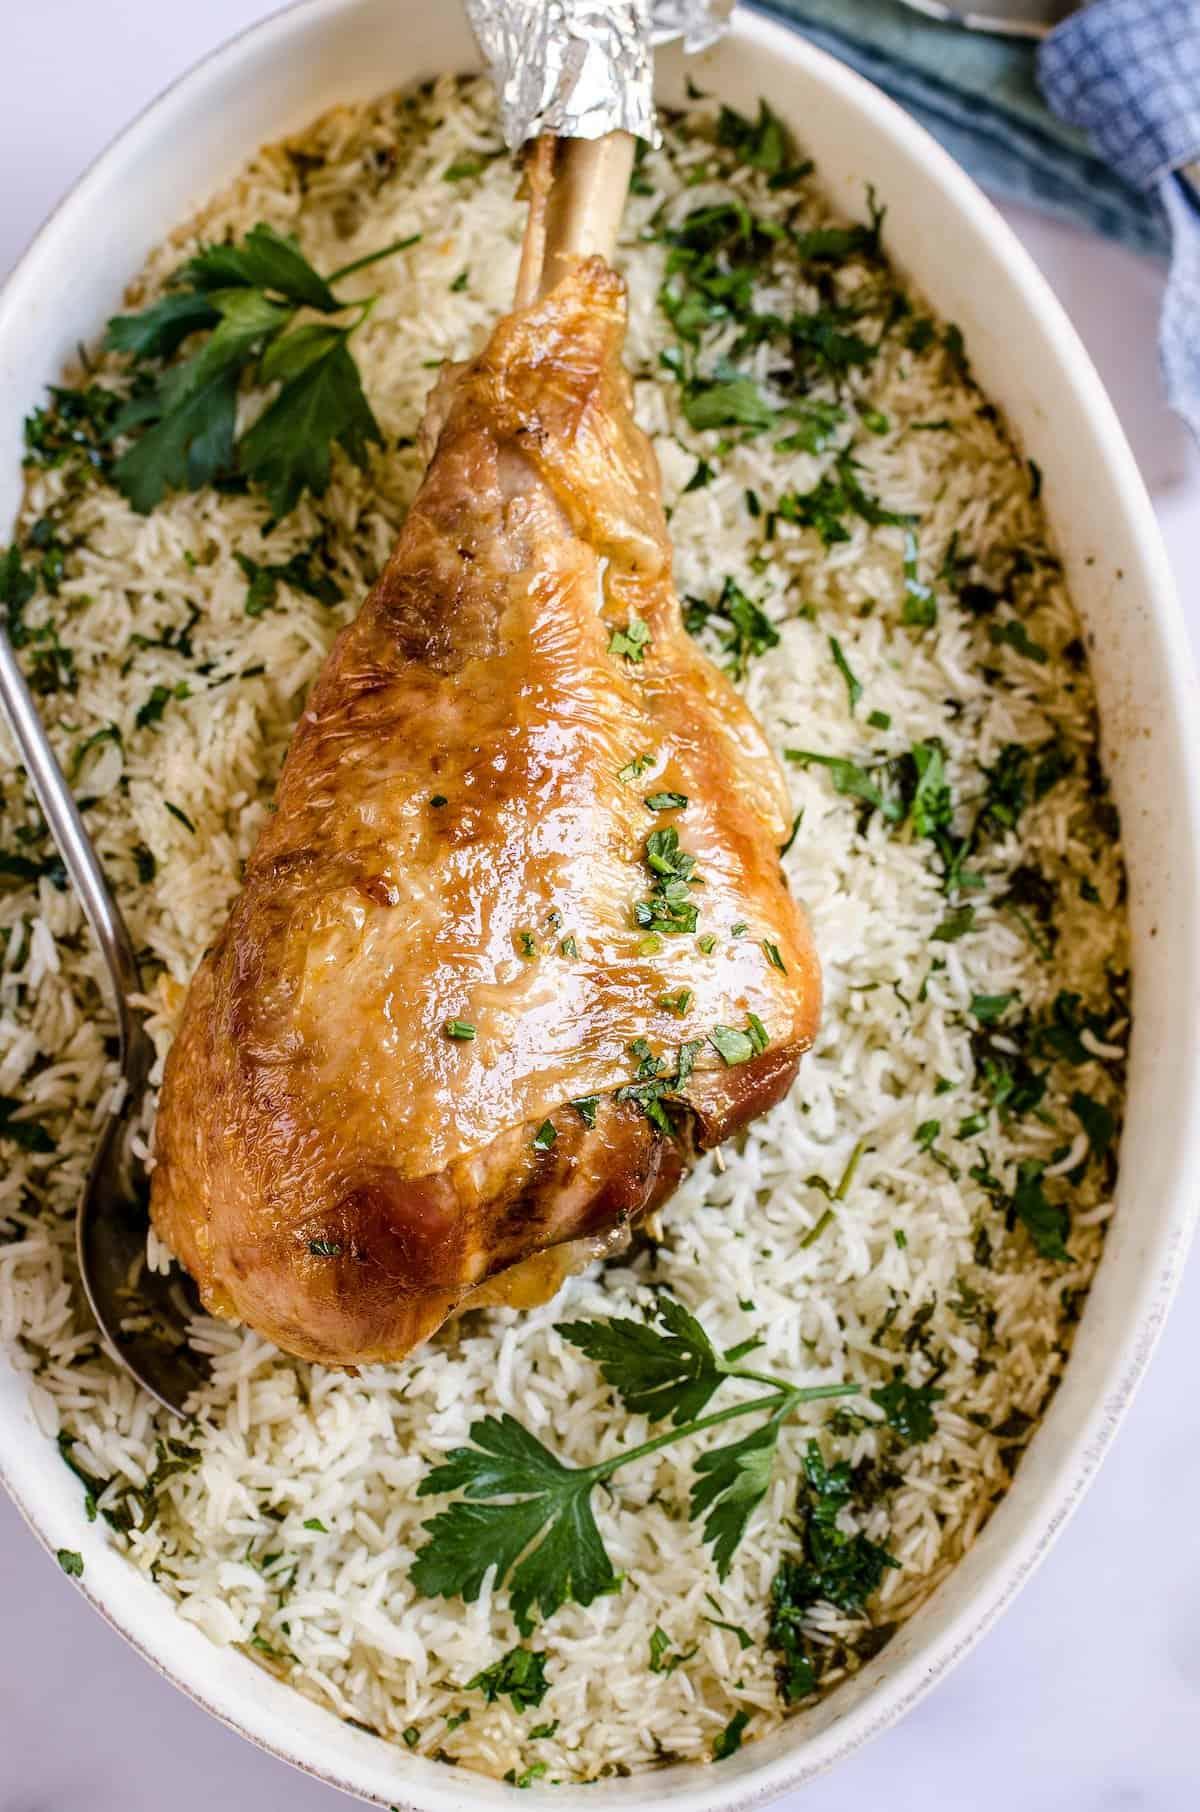 A turkey leg over seasoned rice.